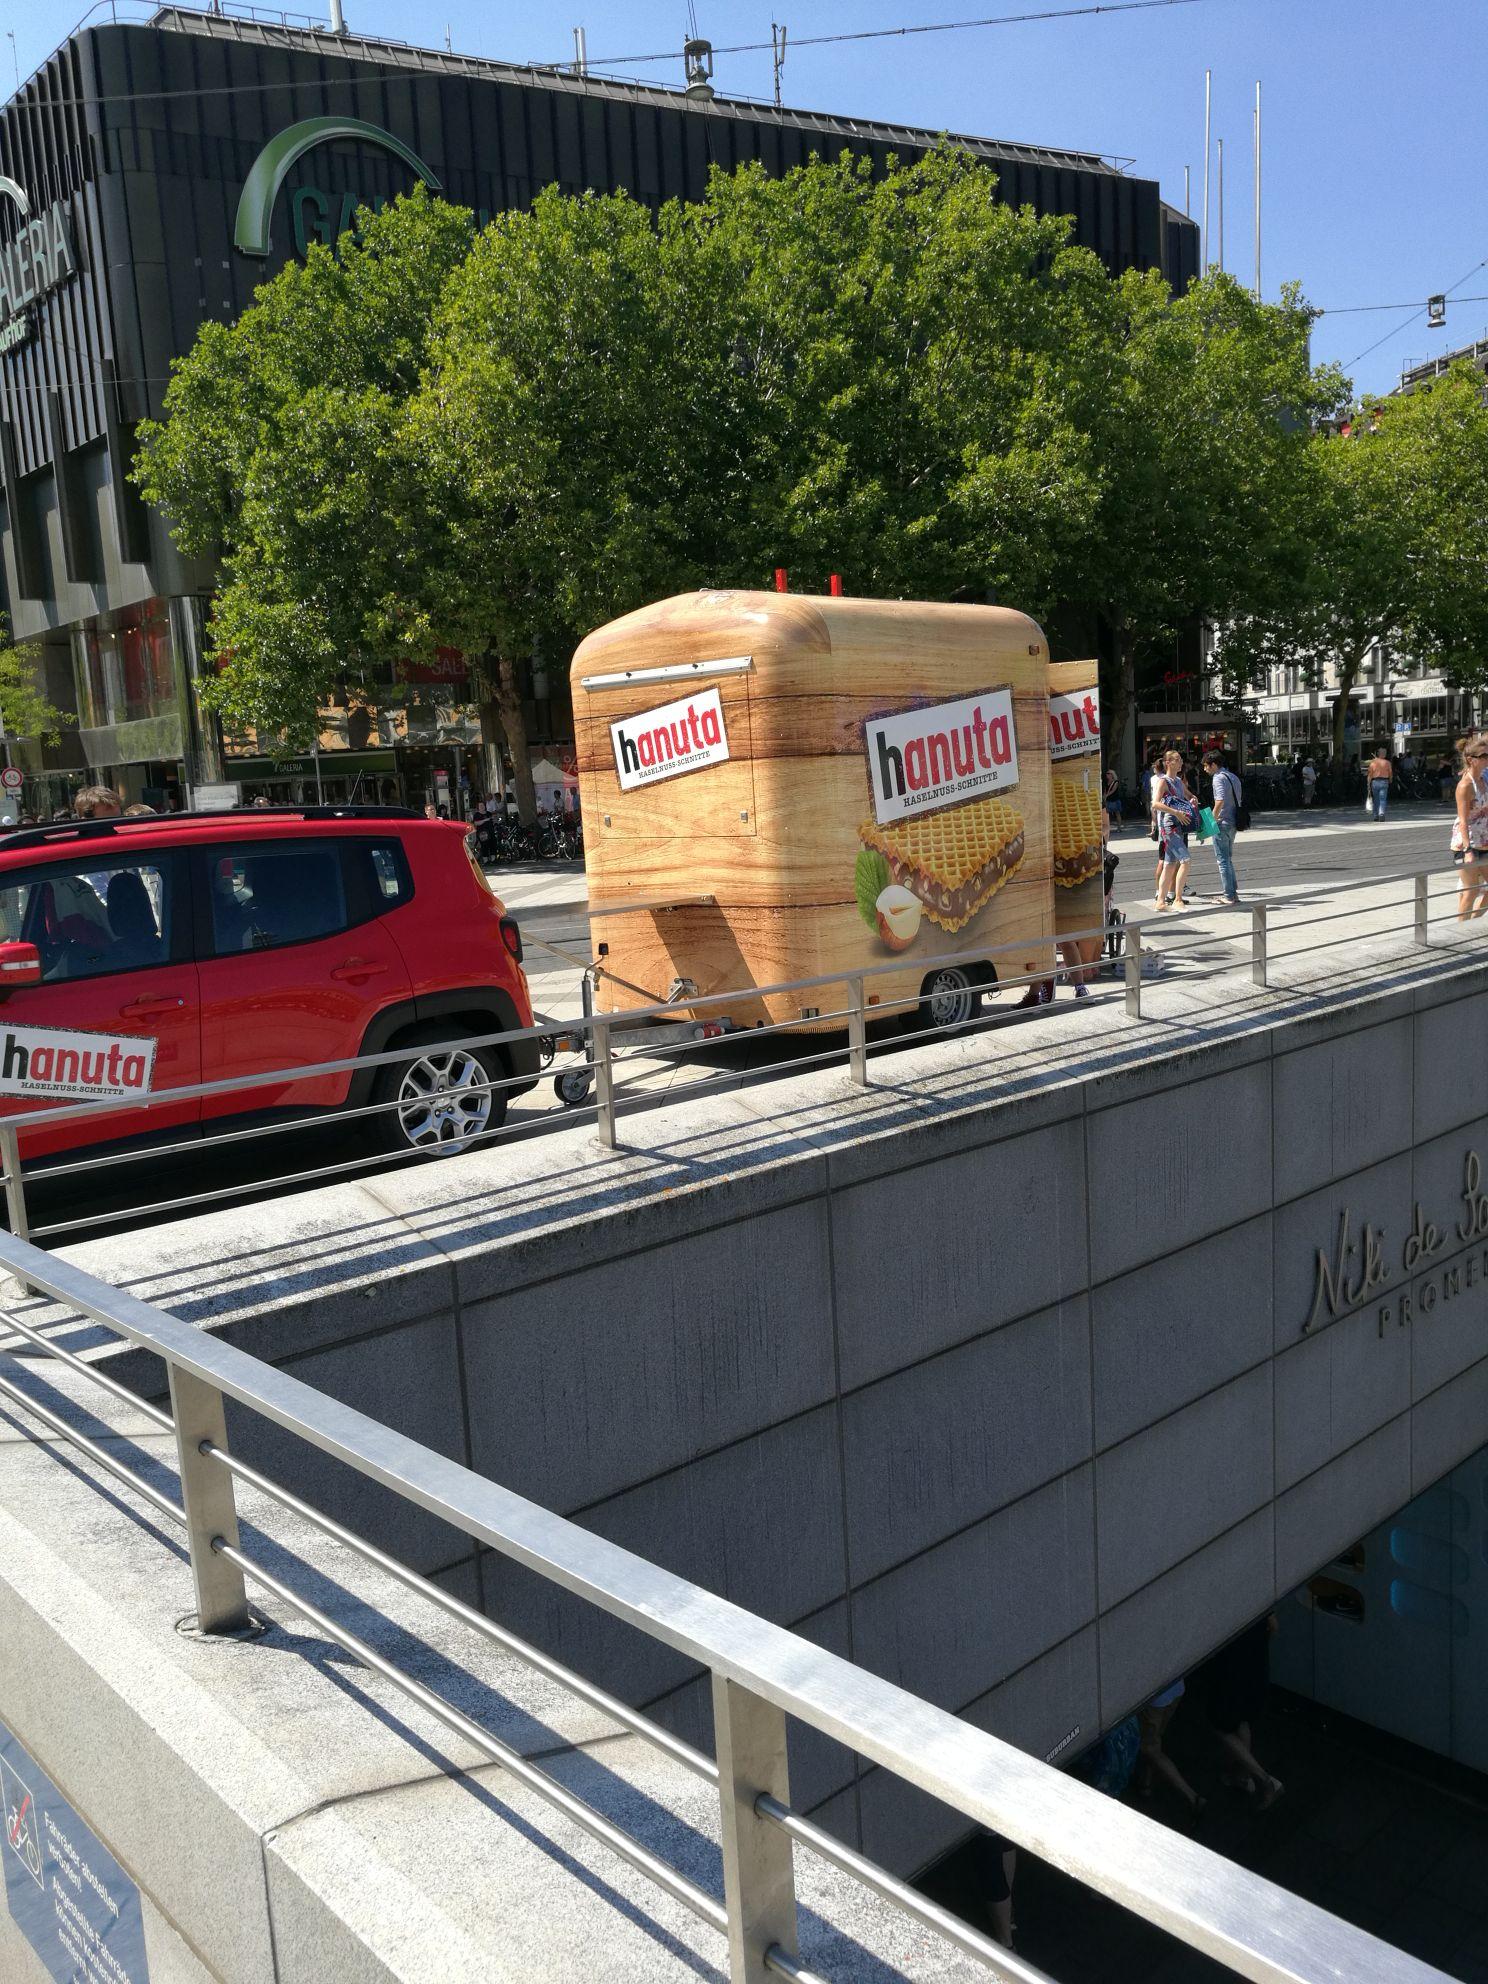 [Lokal Hannover Hbf] Gratis hanuta auf dem Ernst-August-Platz